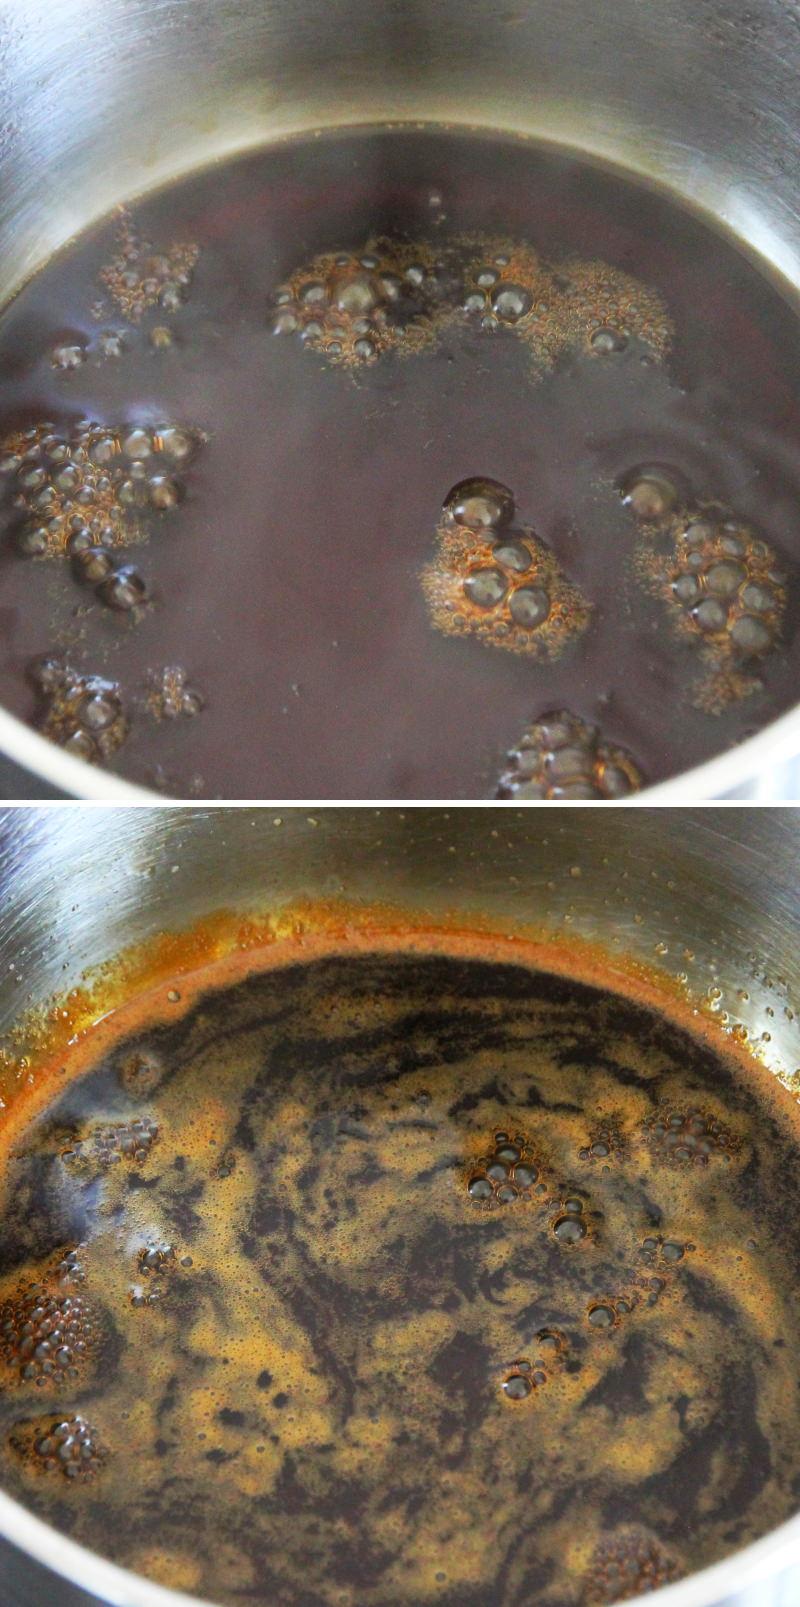 Teriyaki Sauce Schritt 3 Kochen